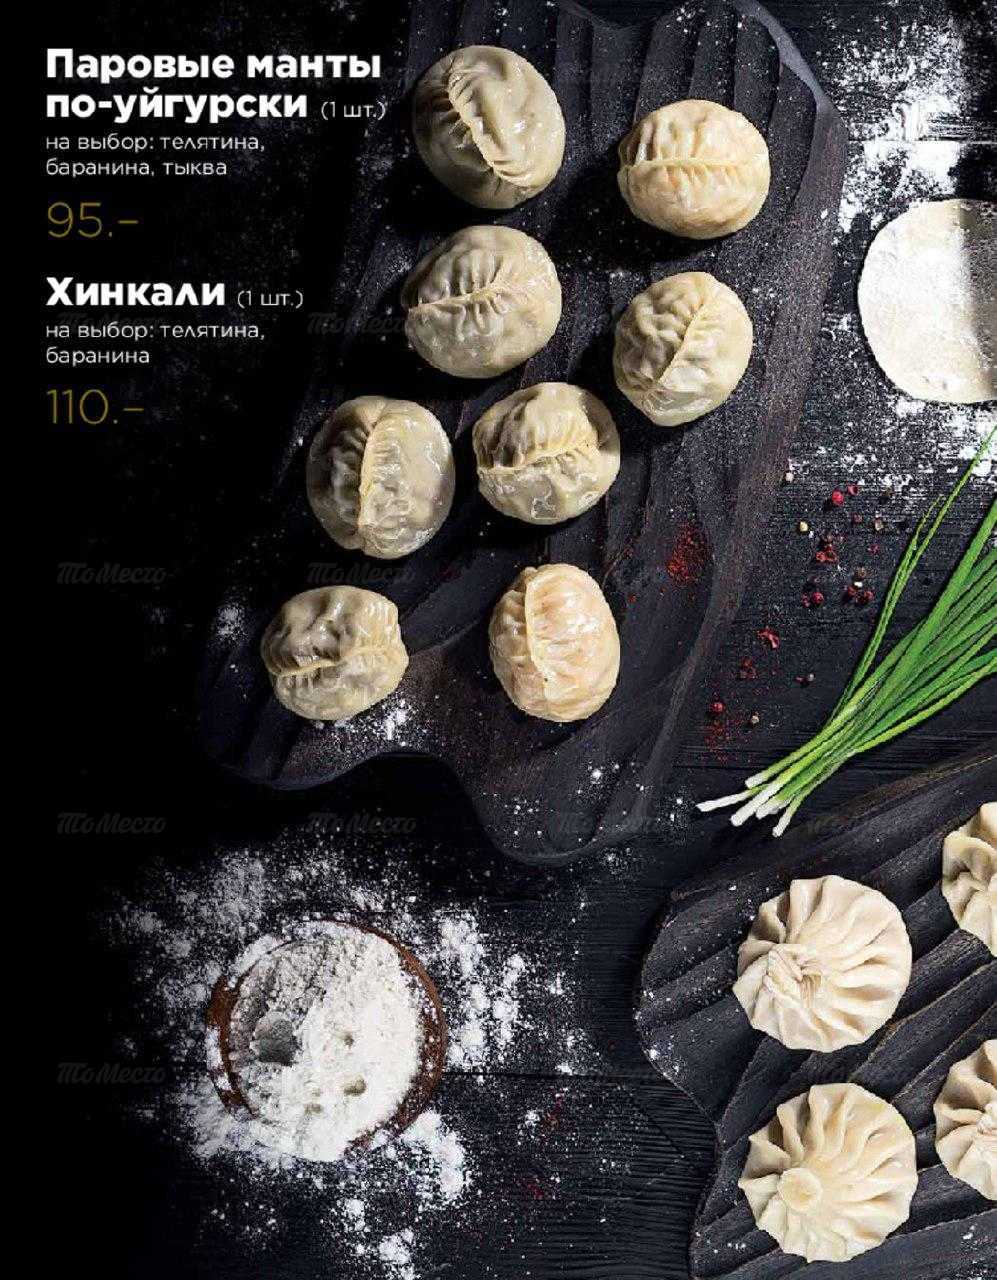 Меню ресторана Урюк на Пушкинской площади фото 20